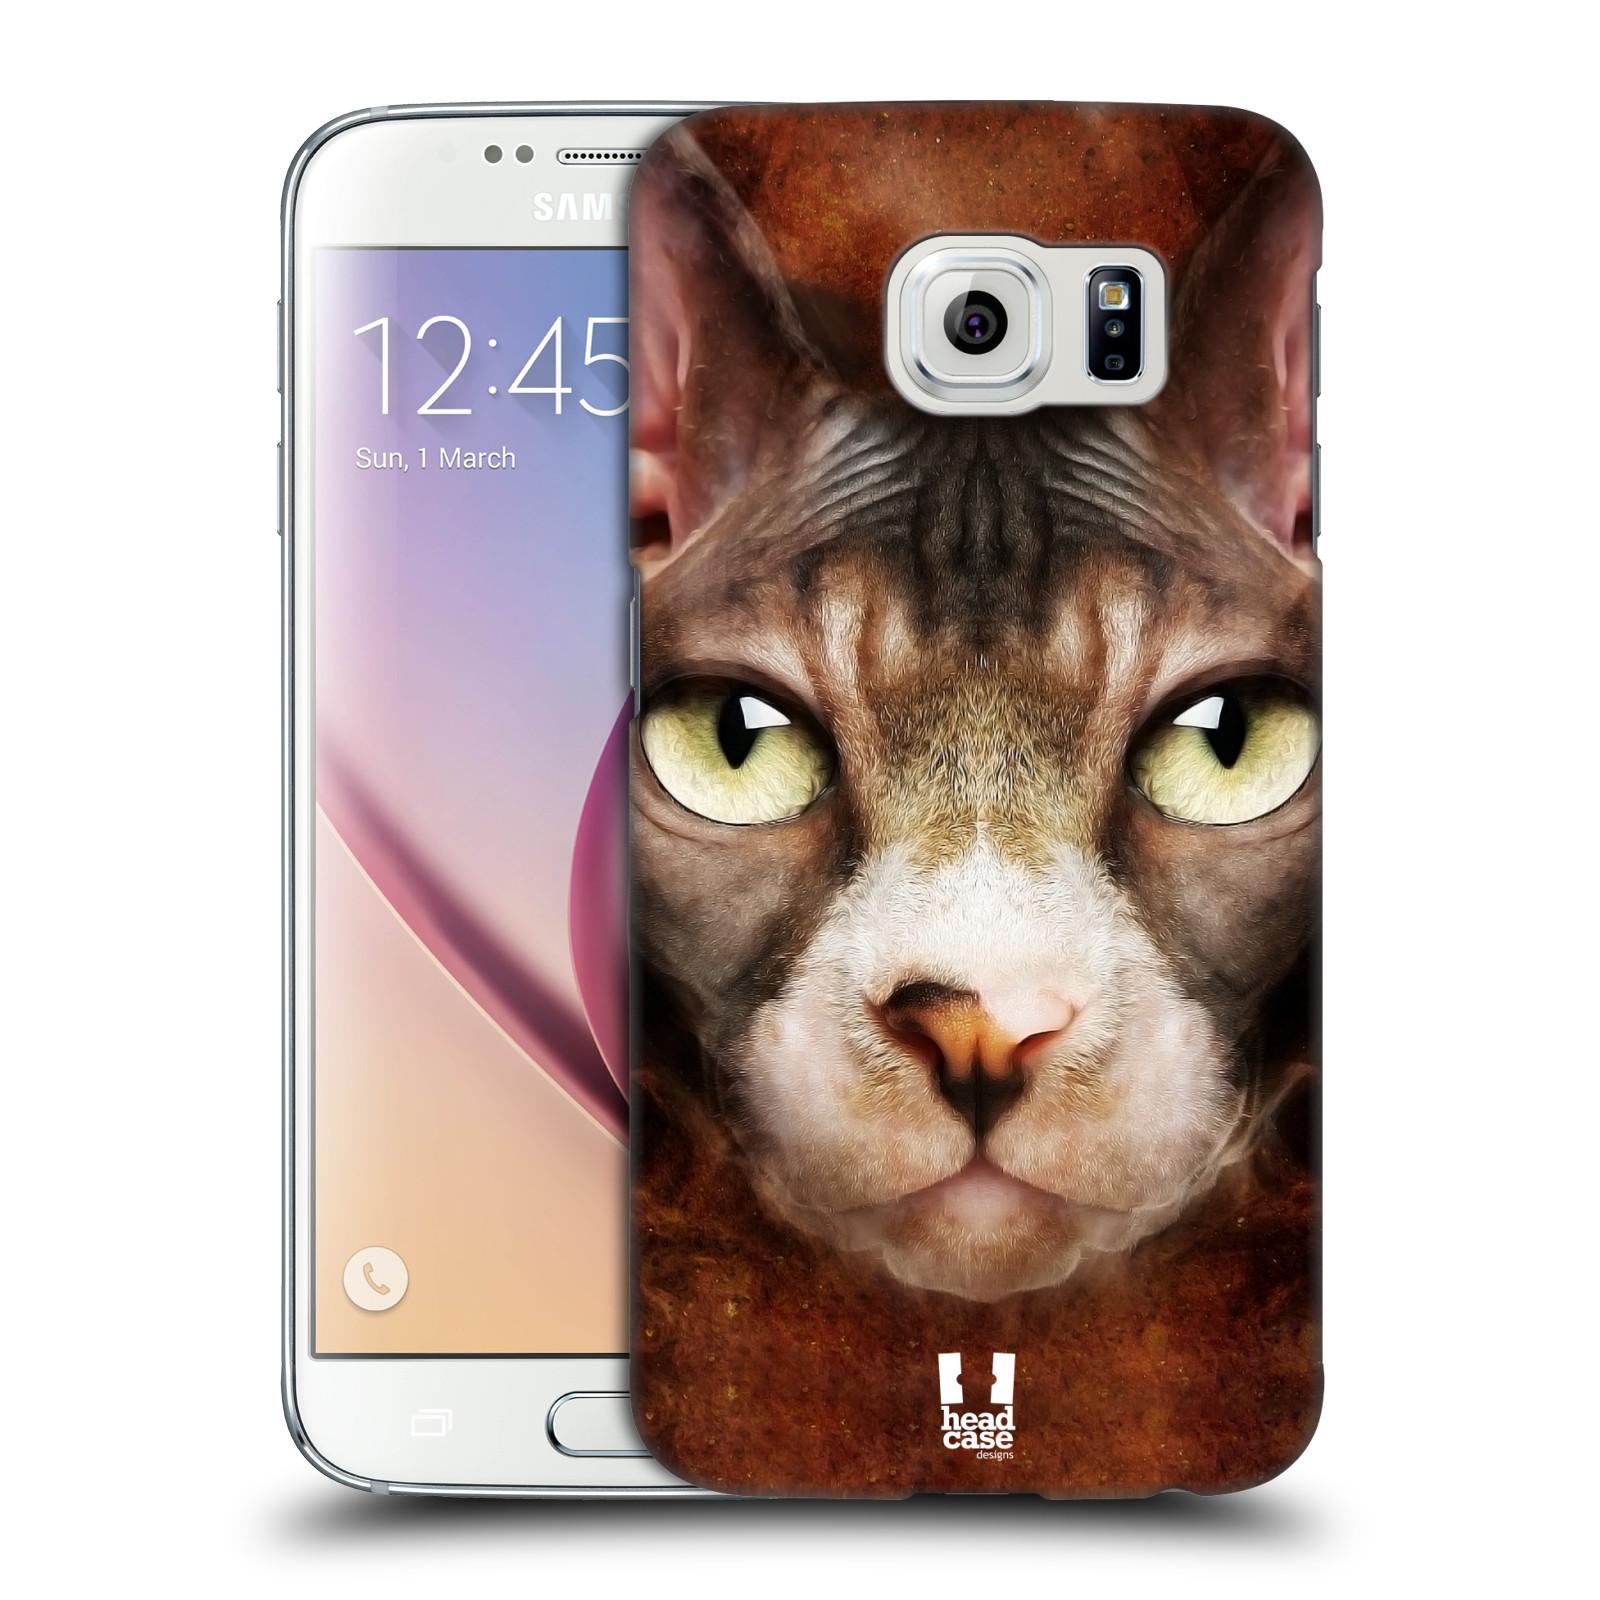 HEAD CASE plastový obal na mobil SAMSUNG Galaxy S6 (G9200, G920F) vzor Zvířecí tváře kočka sphynx